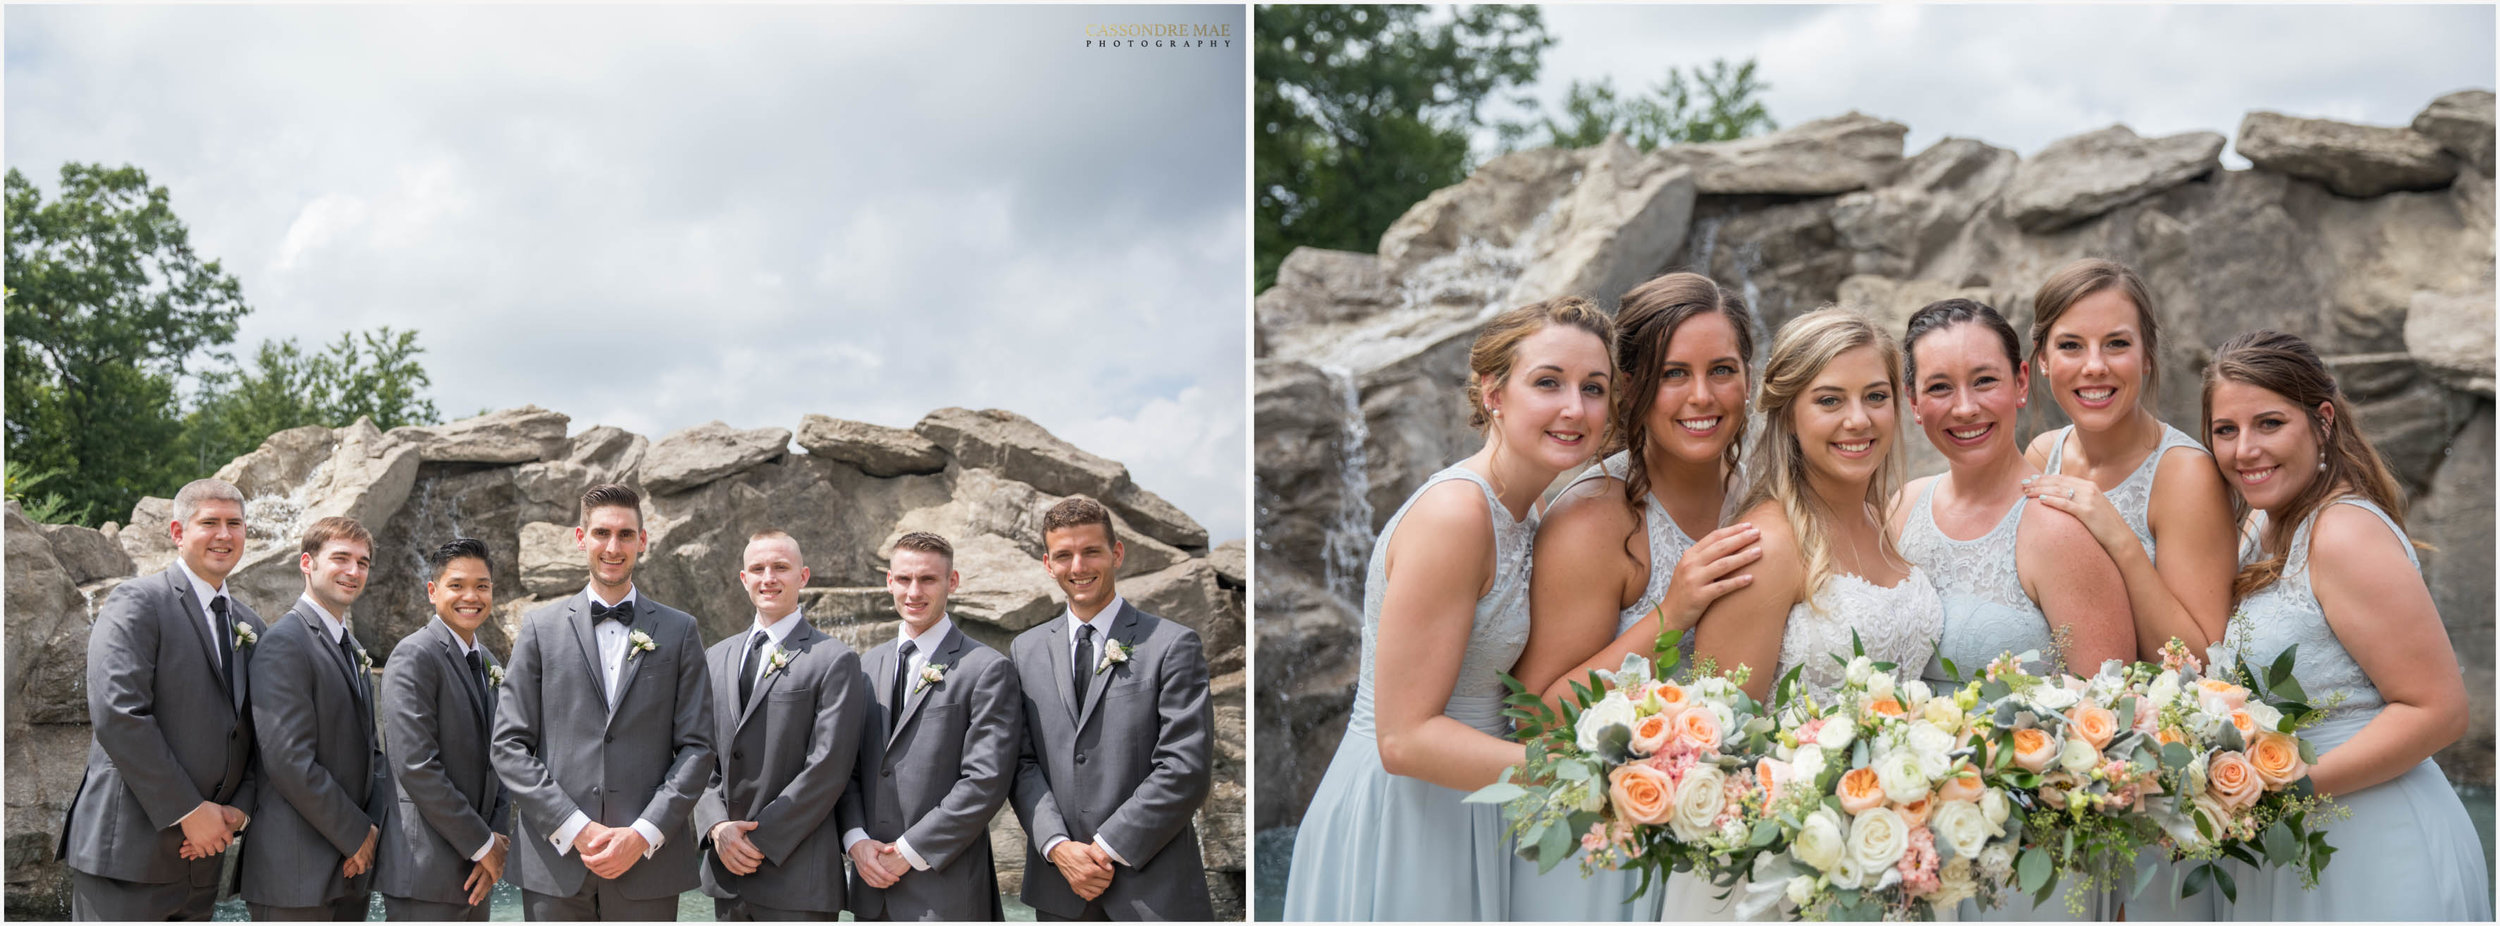 Cassondre Mae Photography Hudson Valley NY Wedding Photographer -16.jpg